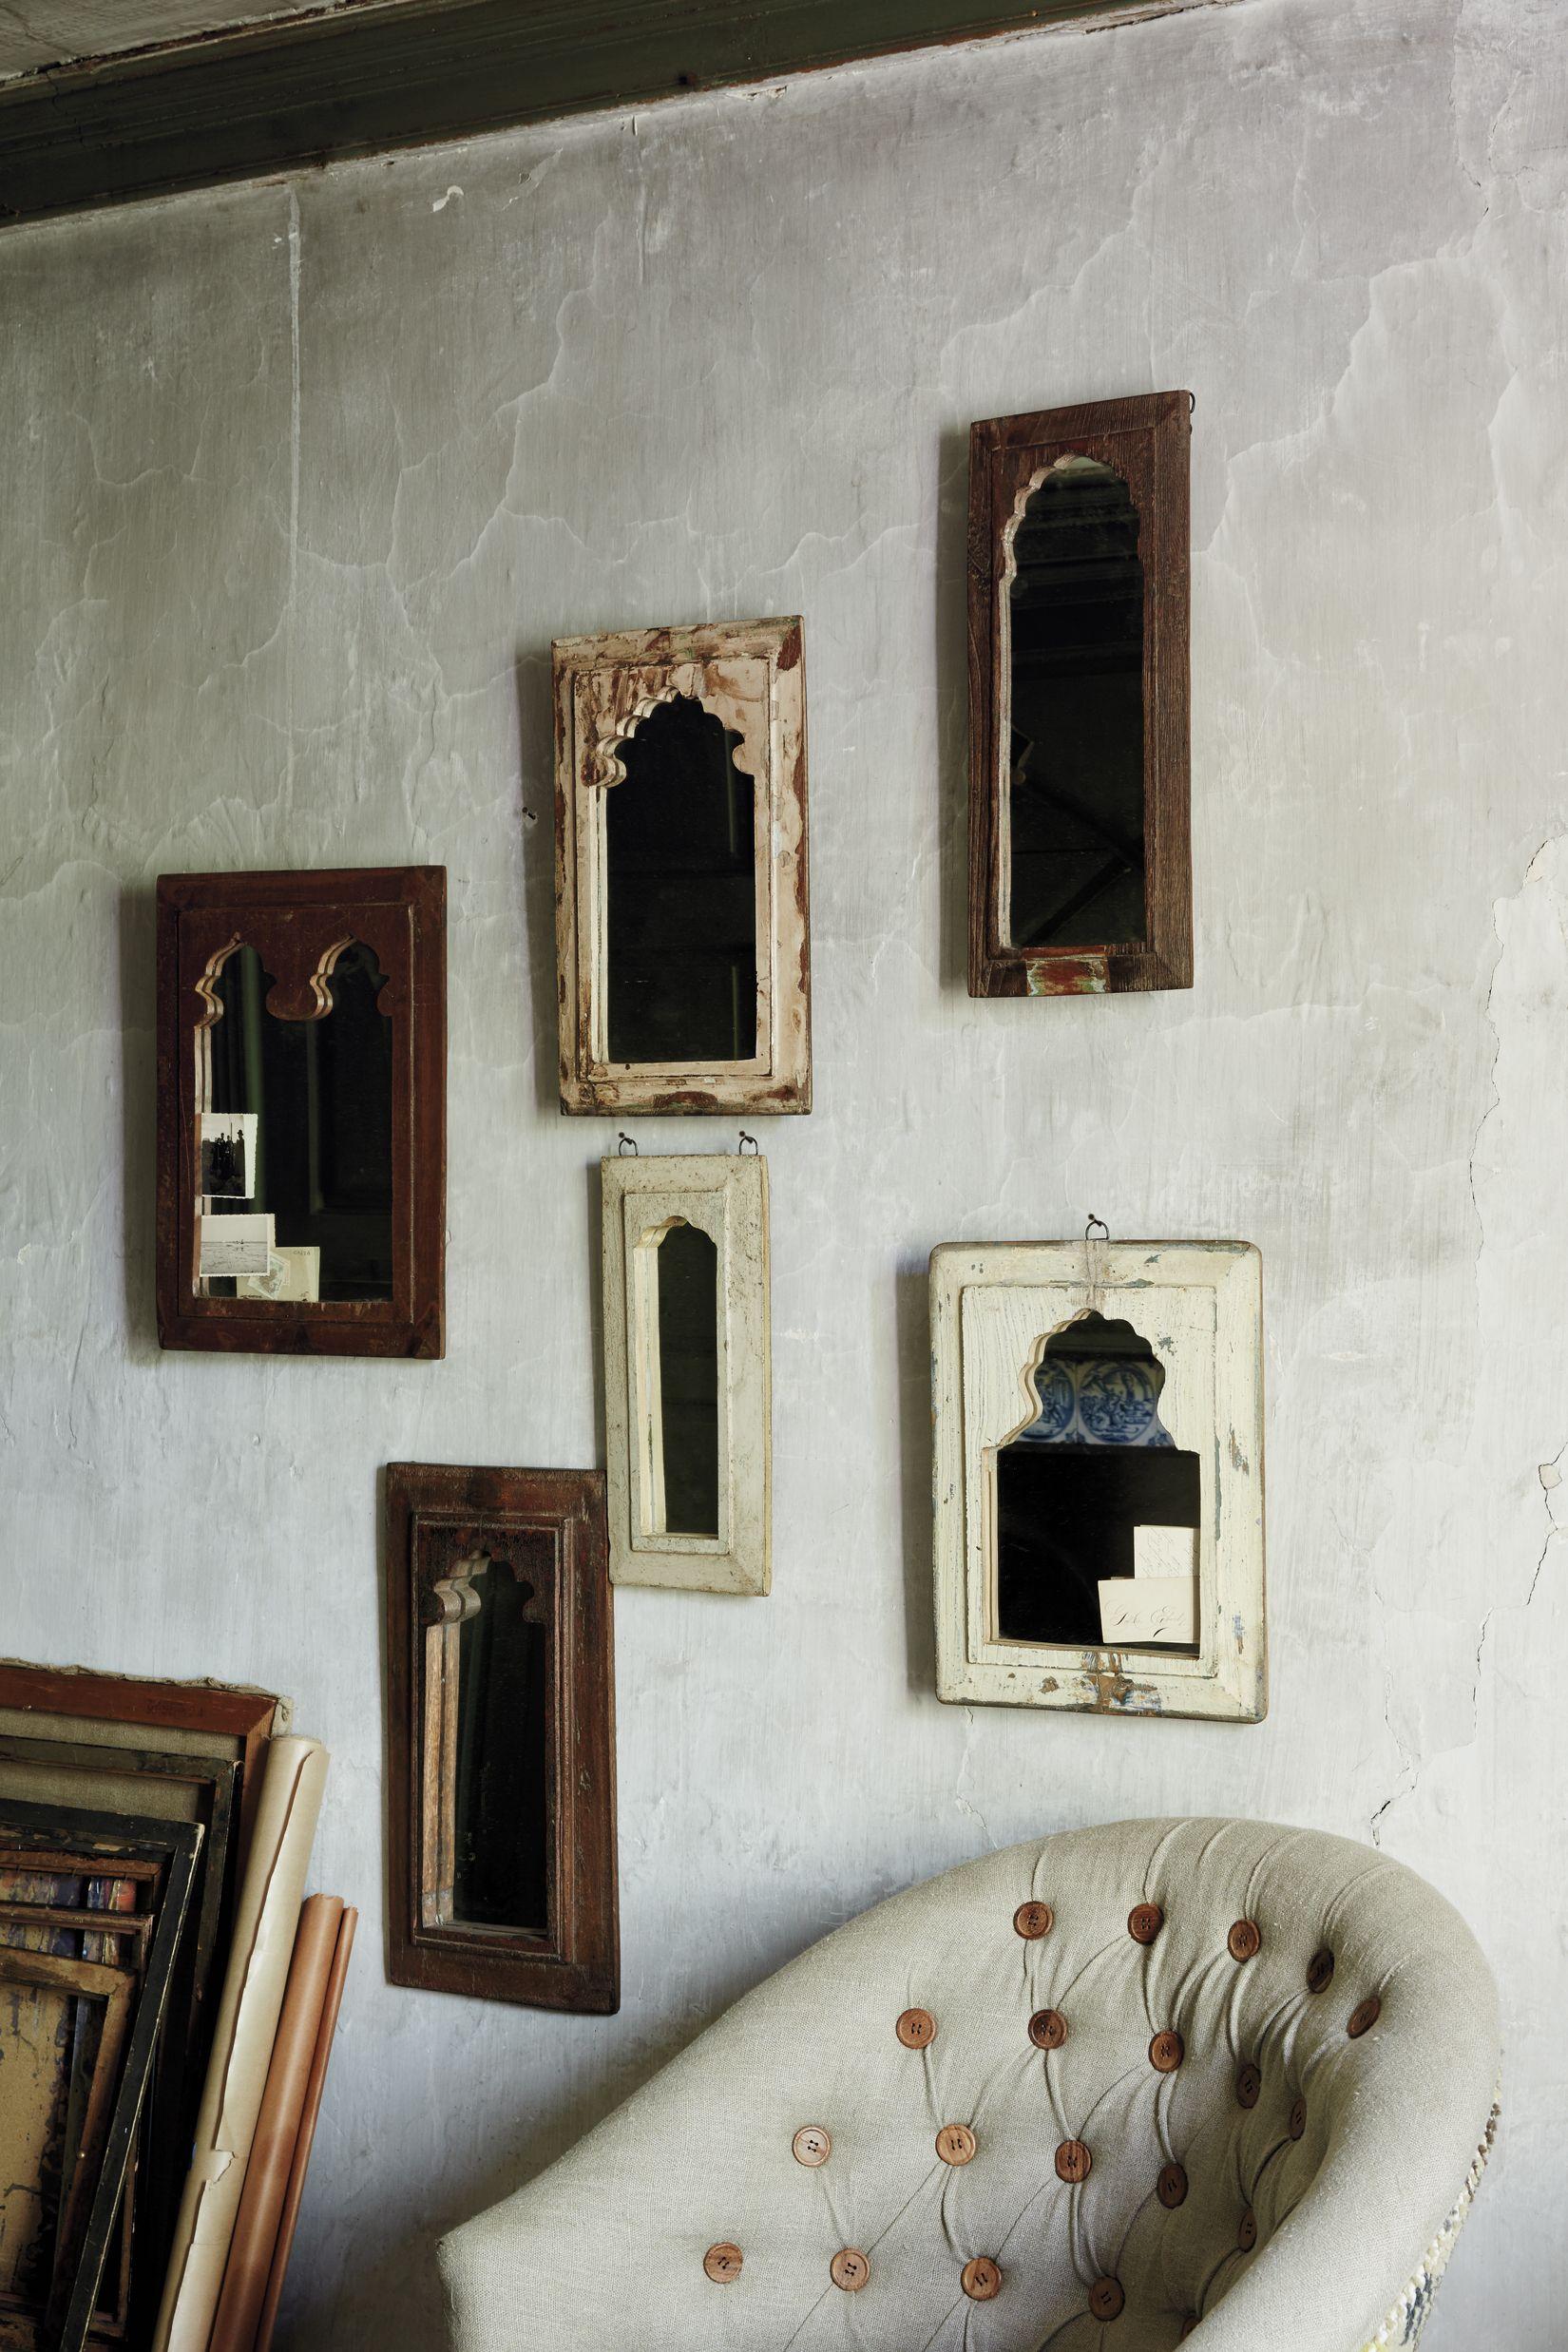 Archway mirror anthropologie interiores pinterest for Espejos decoracion interiores